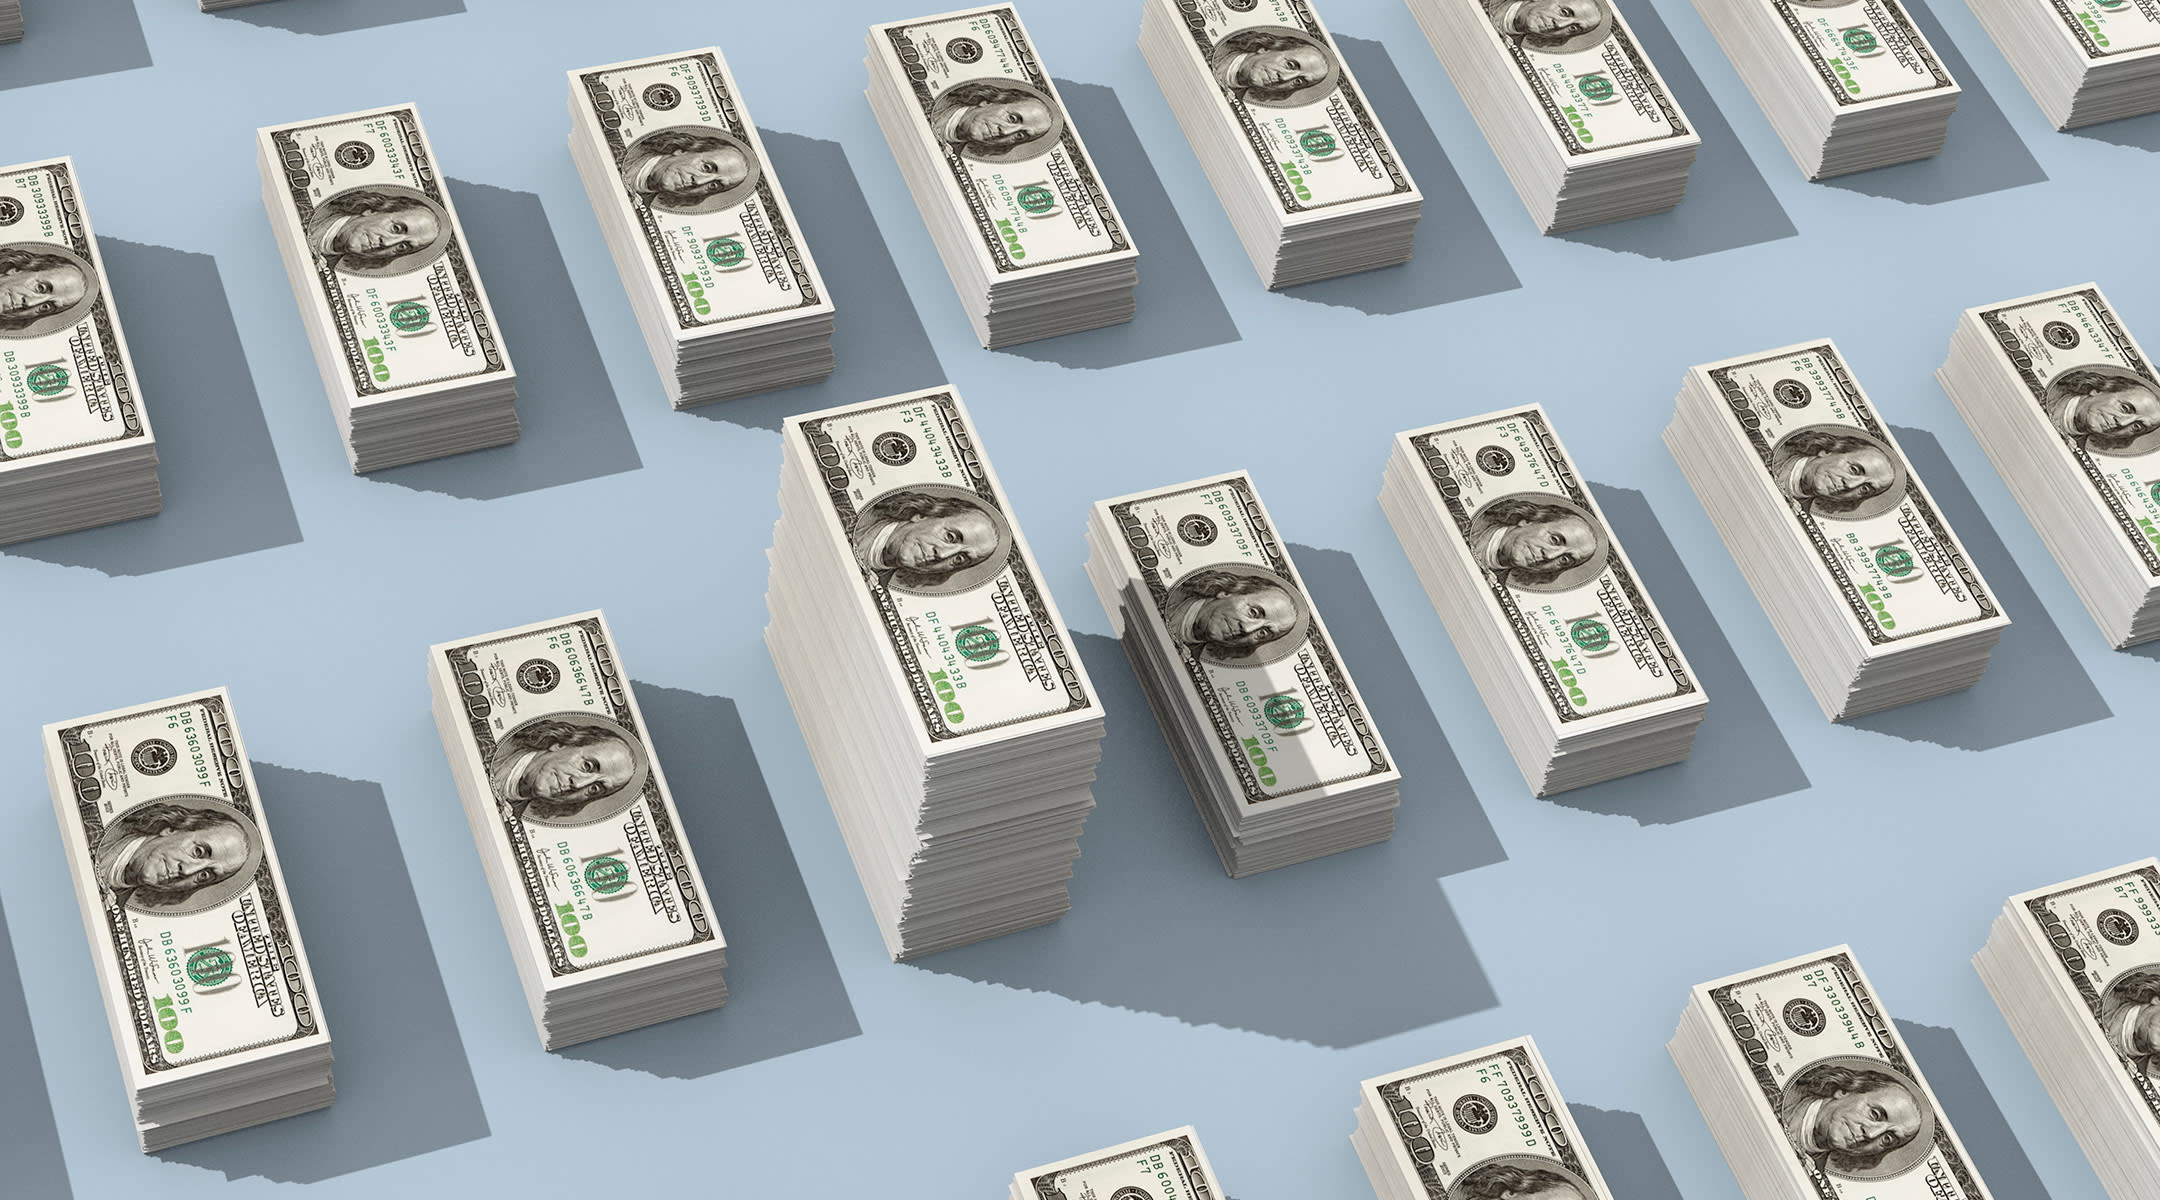 Stacks of money represent unpaid labor of women